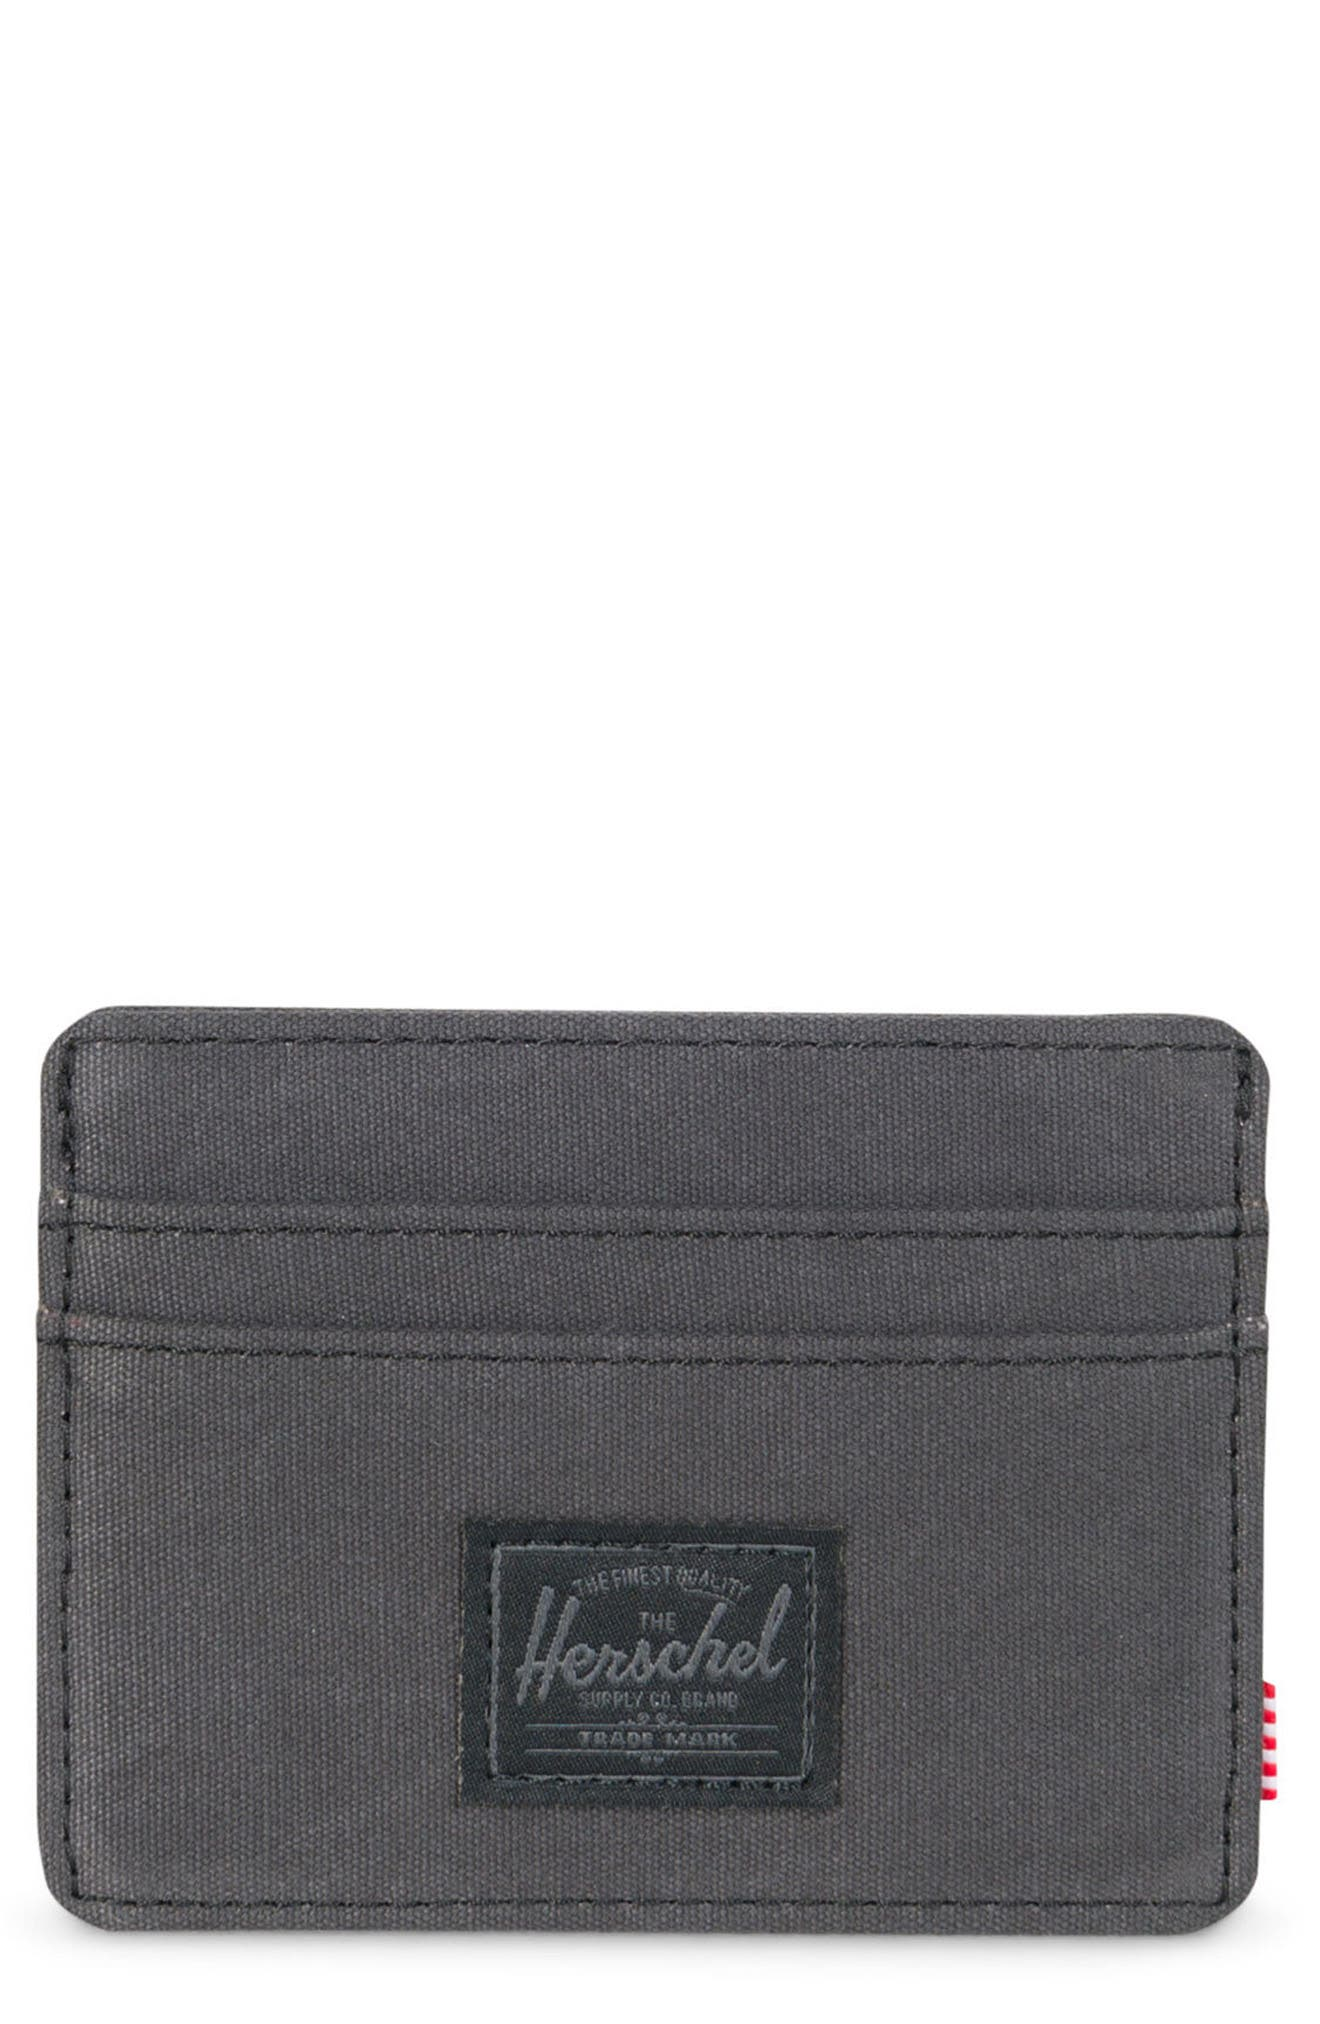 Charlie Card Case,                         Main,                         color, 001